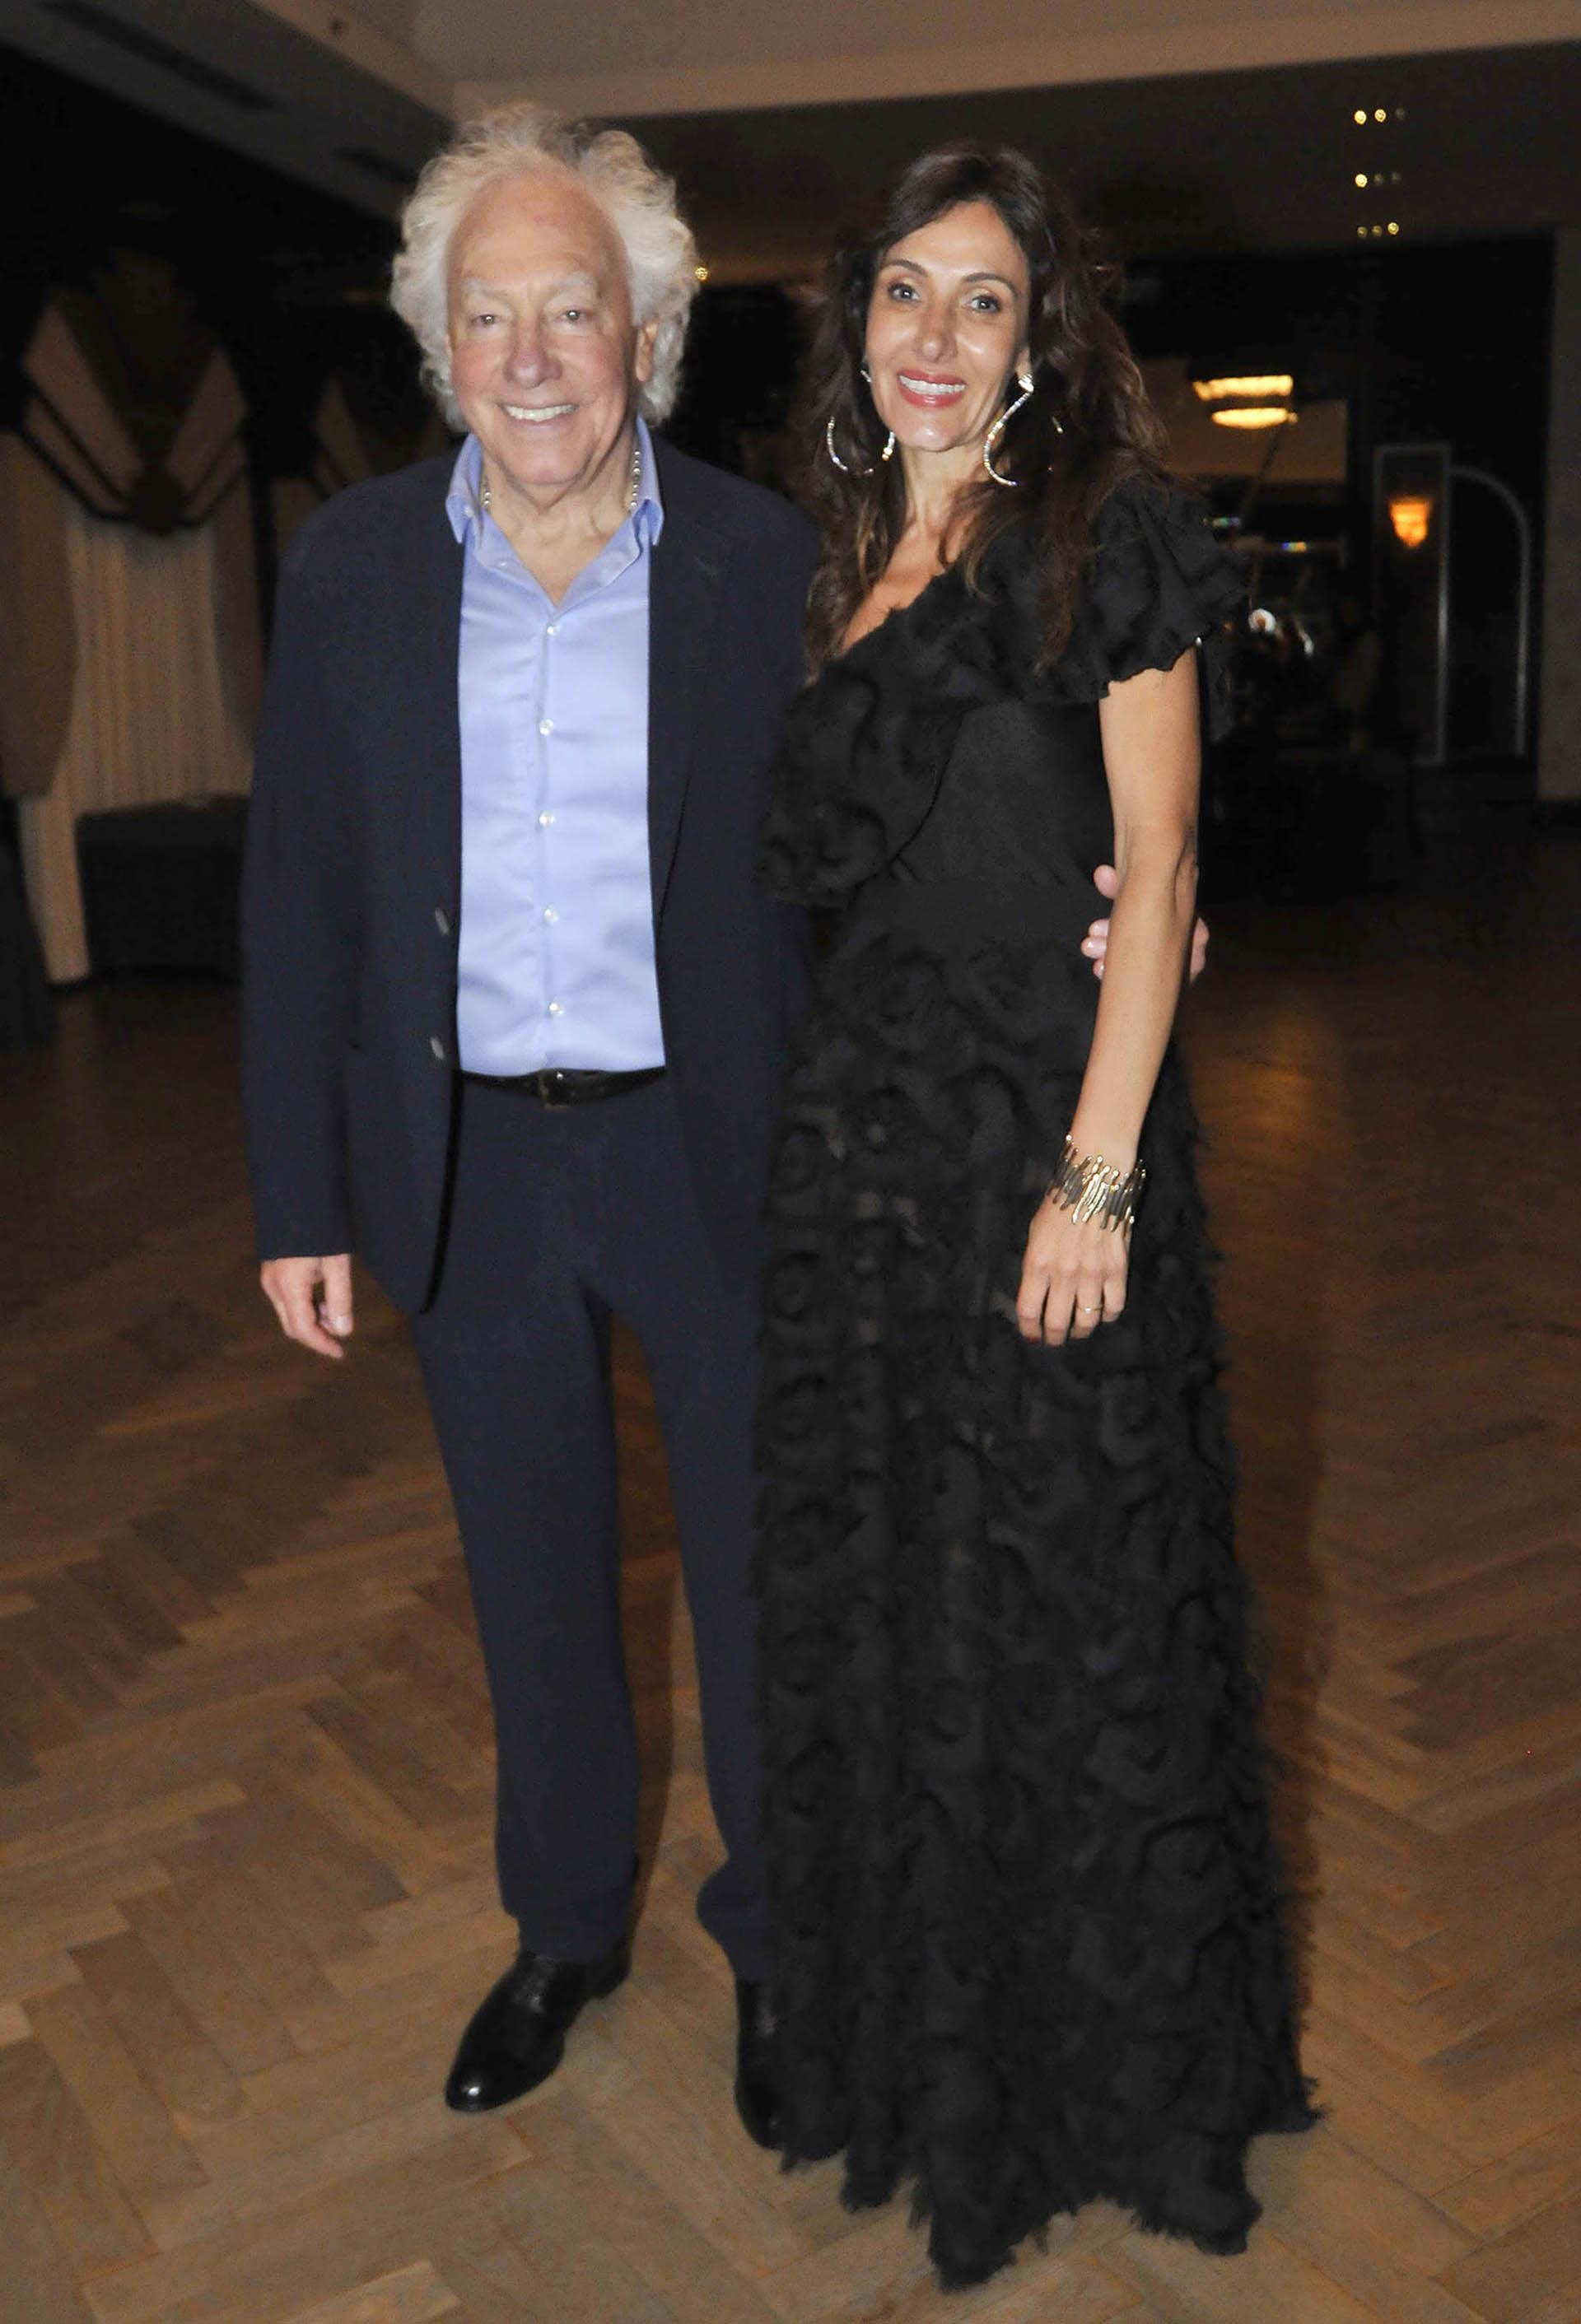 Guillermo Cóppola llega a la fiesta en Tango Porteño acompañado por su esposa, Corina Juárez (Fotos: Teleshow)